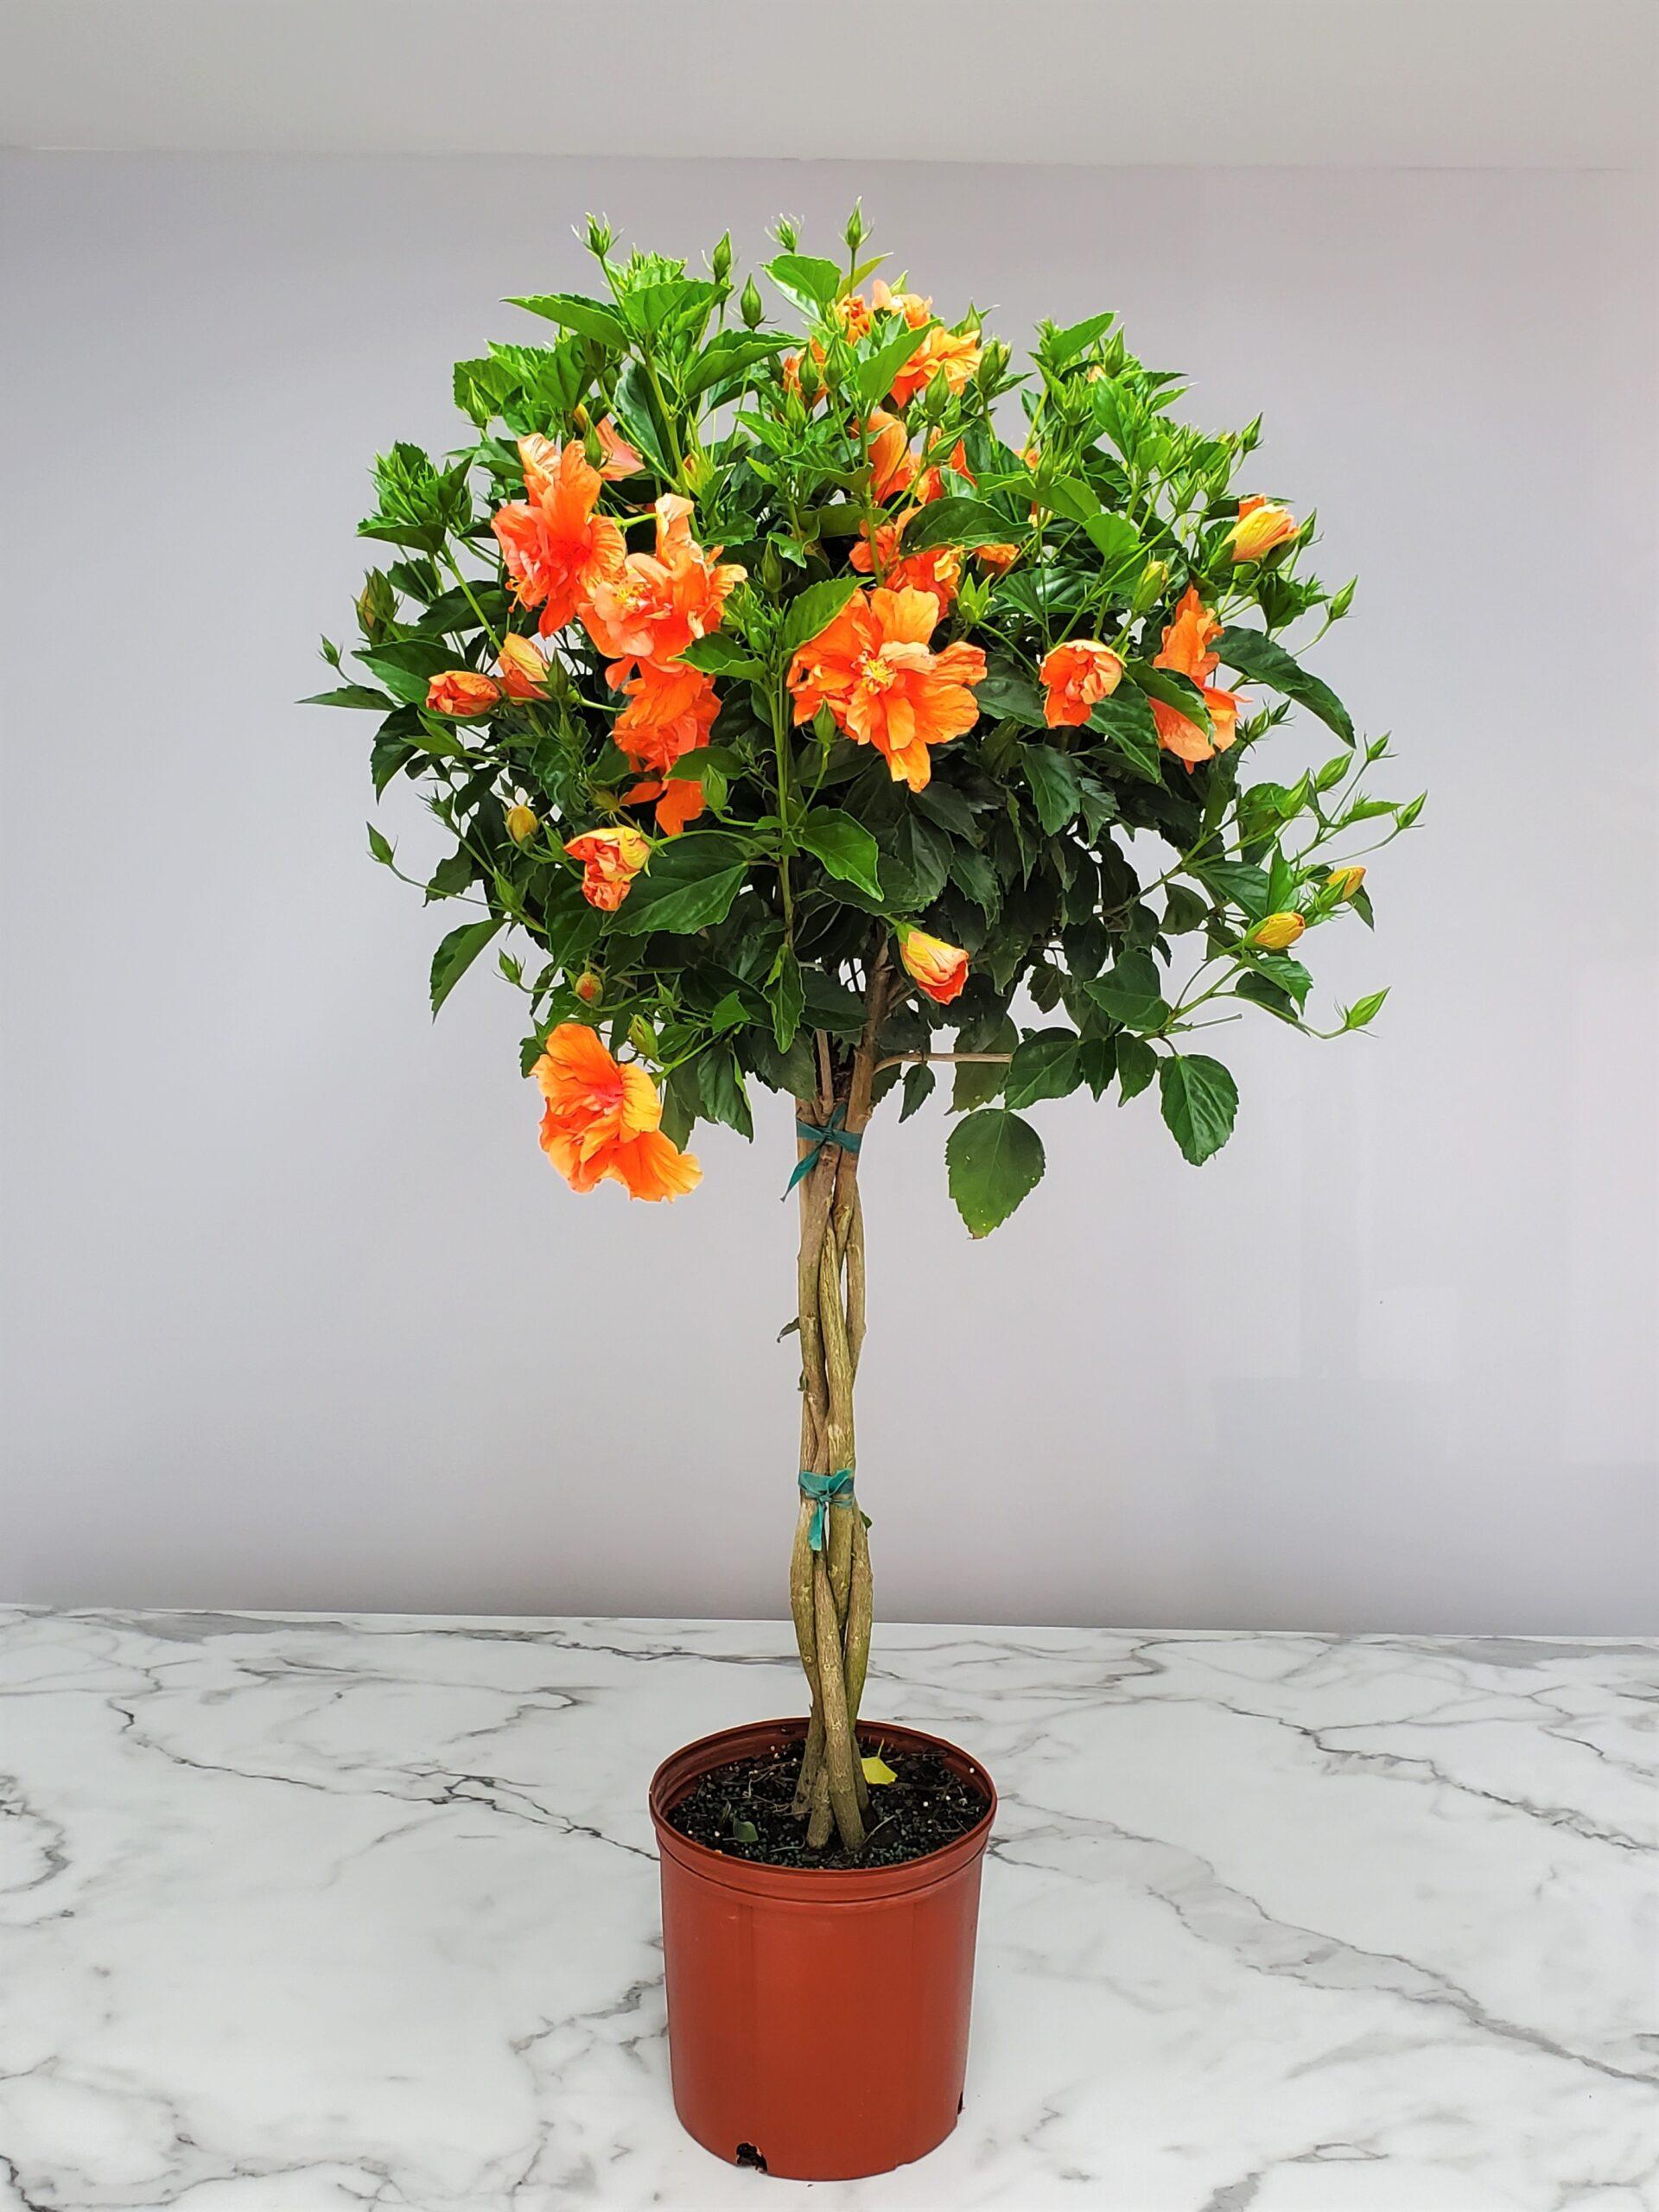 Braided Hibiscus Tree Peach Double Flower 3 Gallon